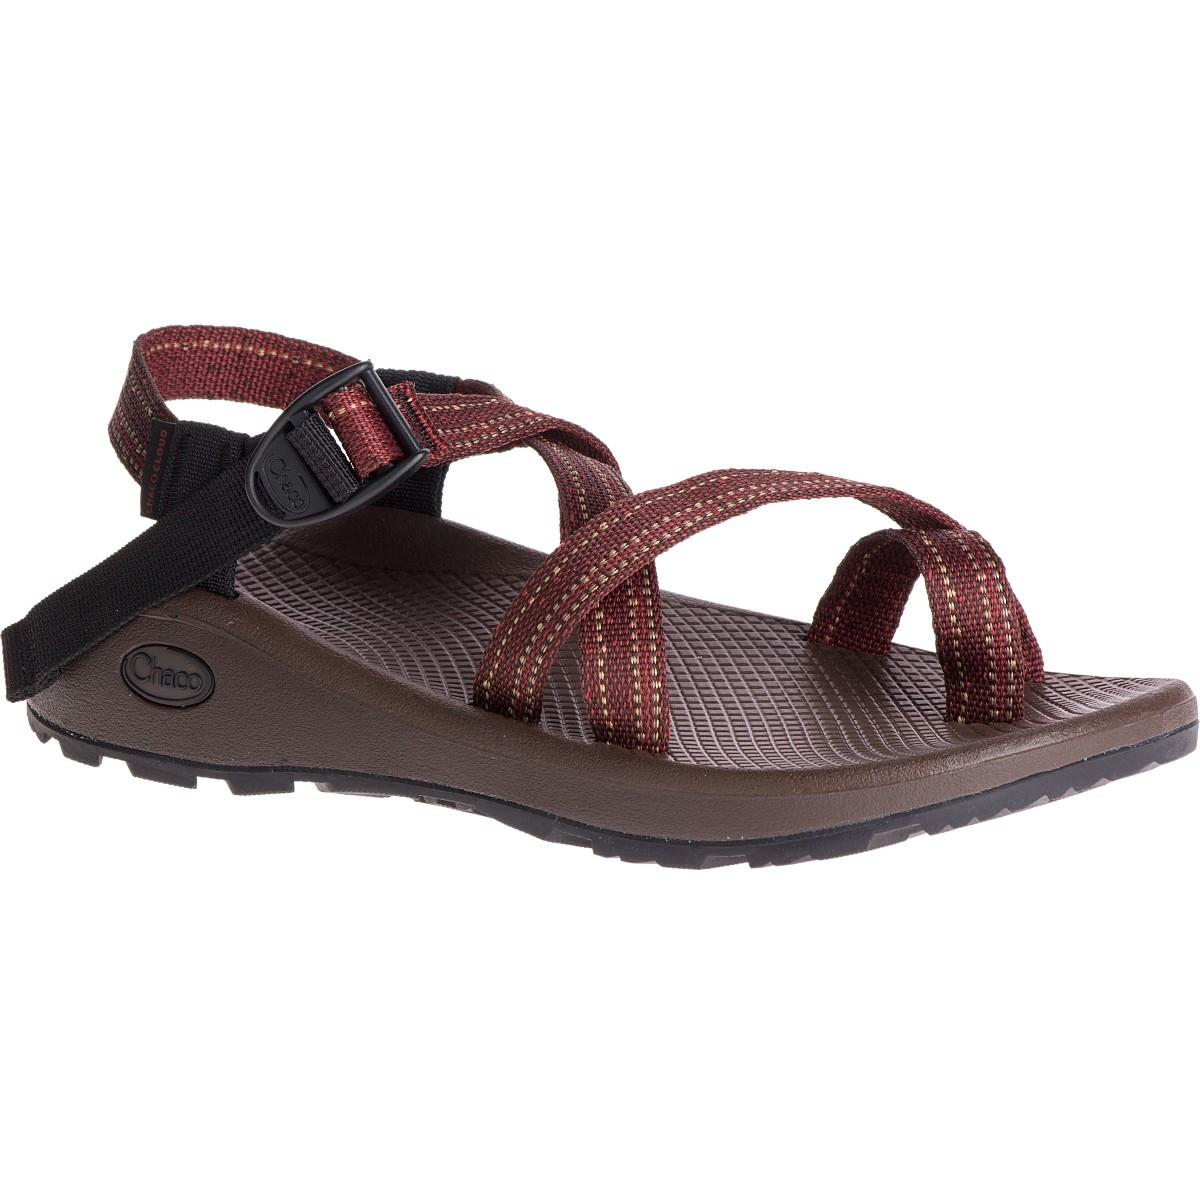 37a22f6ed8df Chaco ZCloud 2 Sandal - Mens